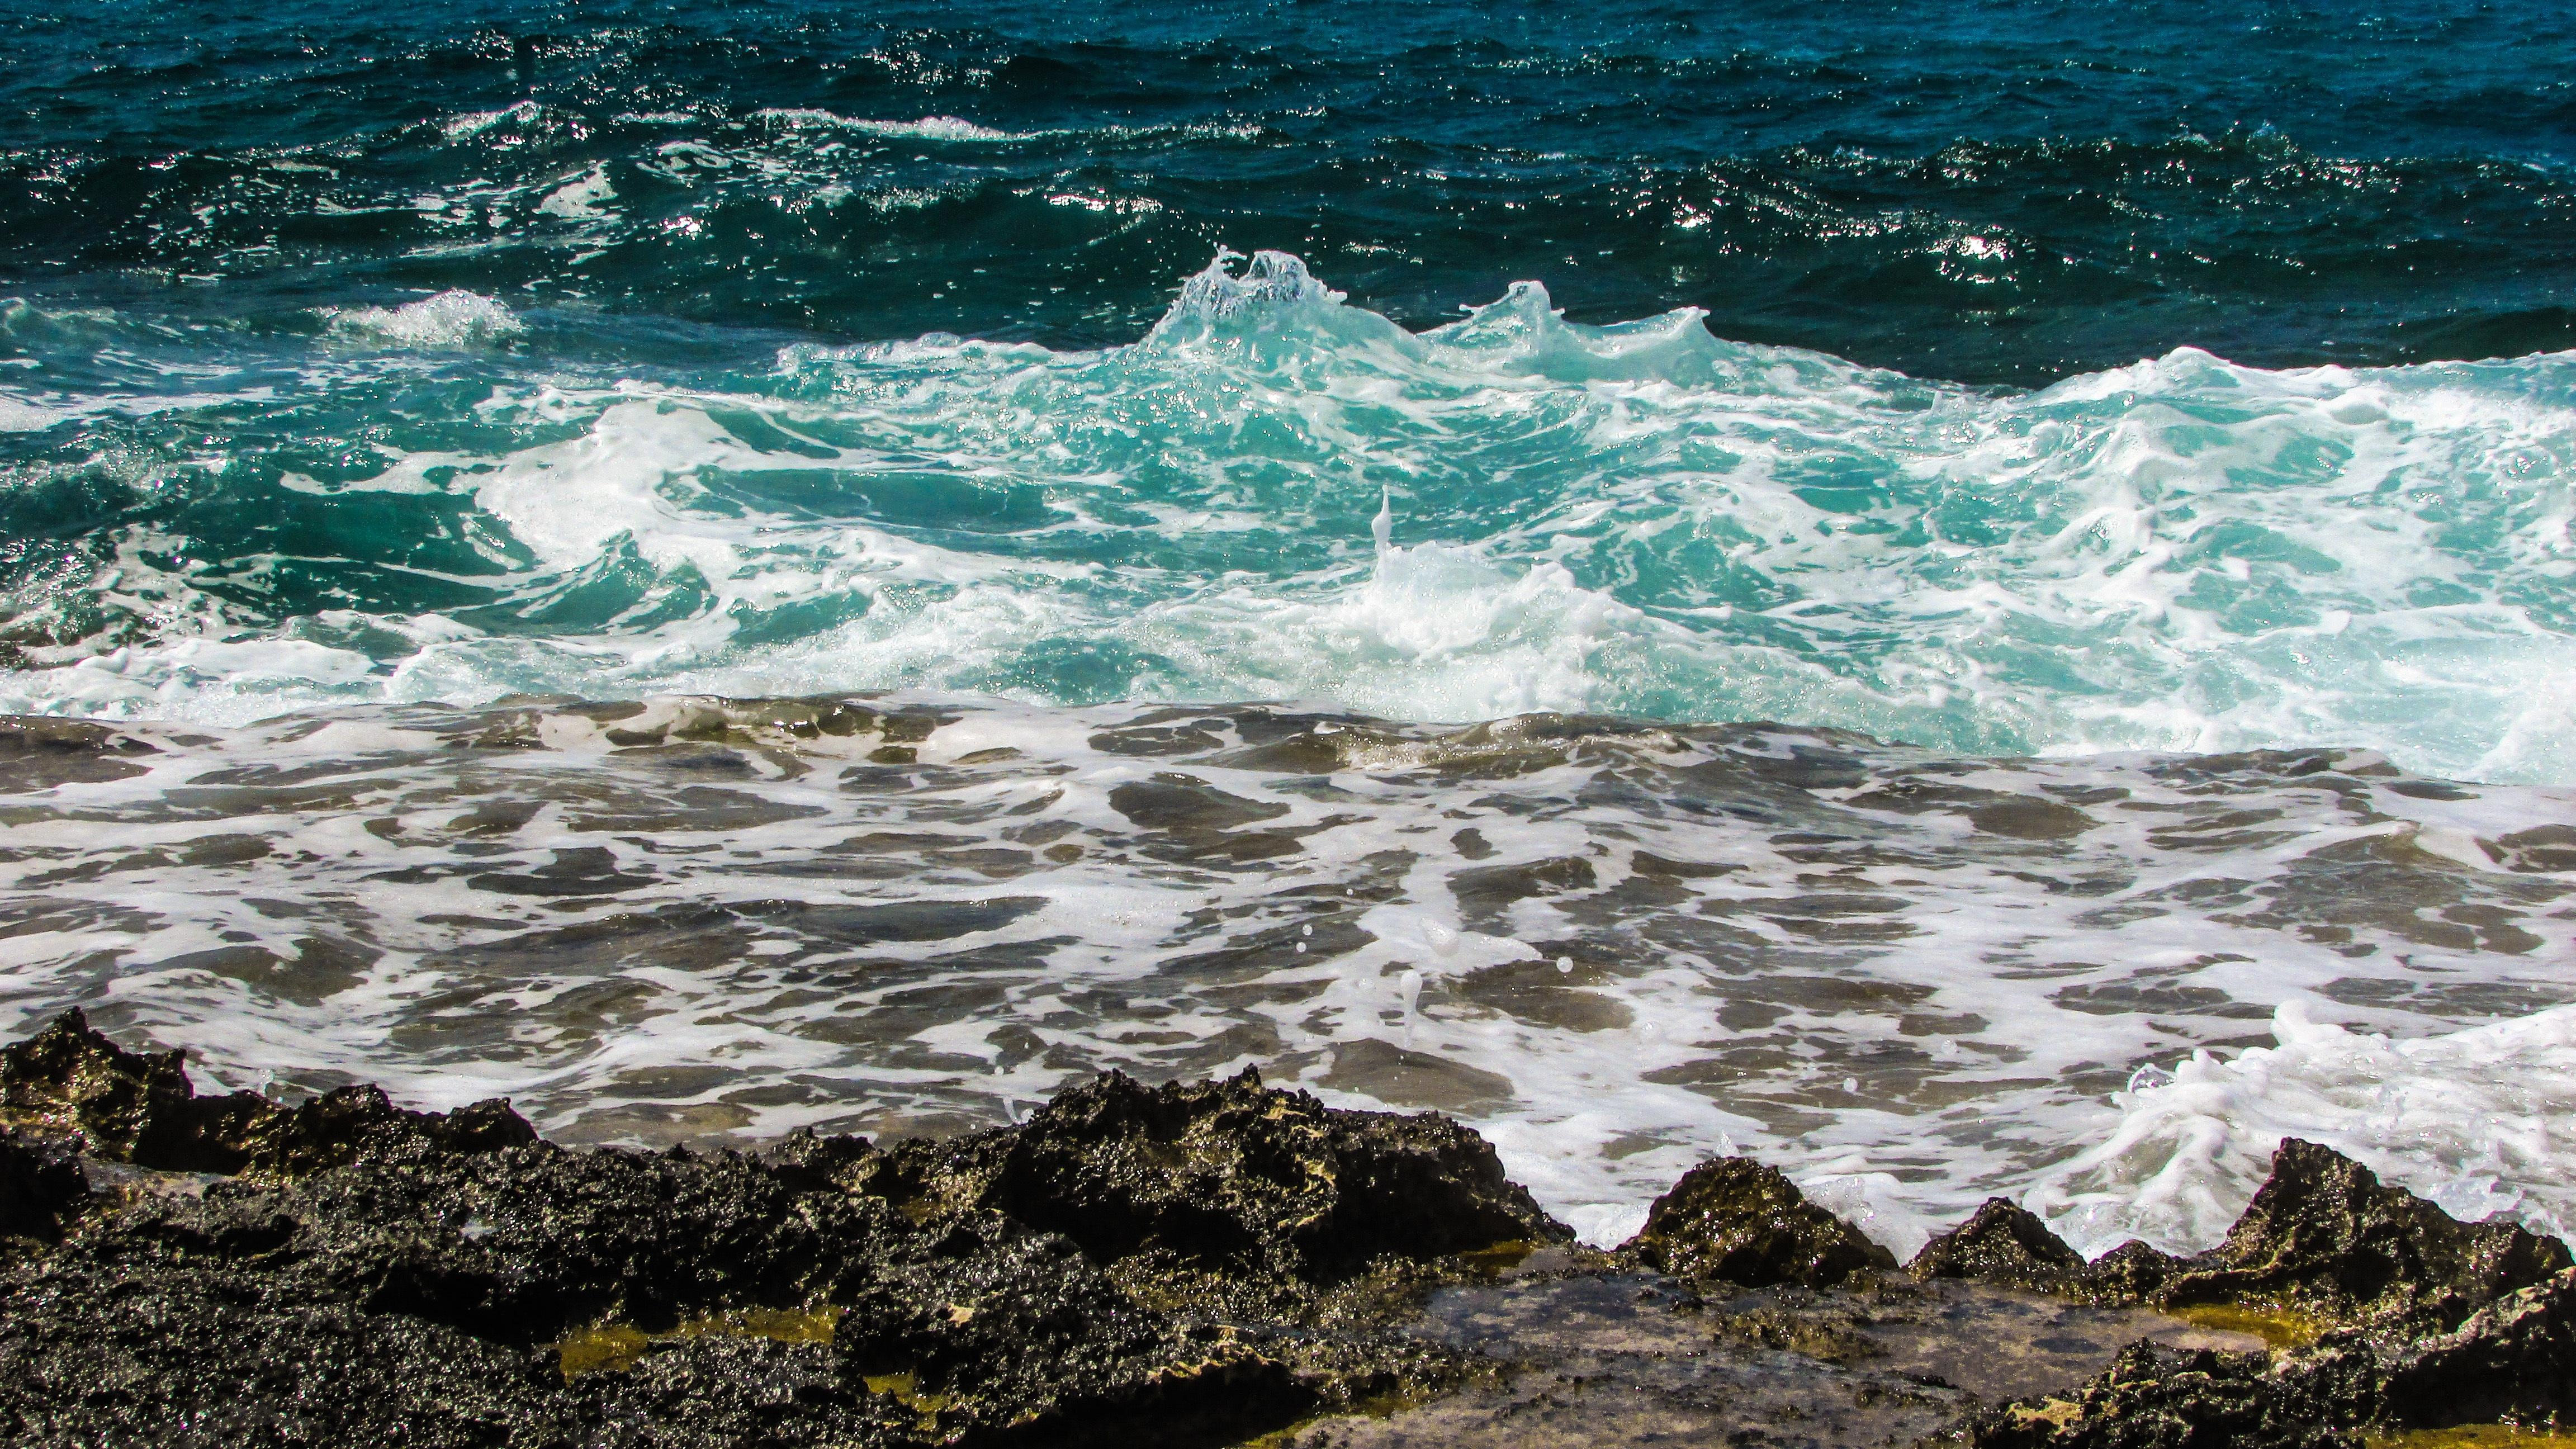 фото открытый океан море пляж стиле трэш